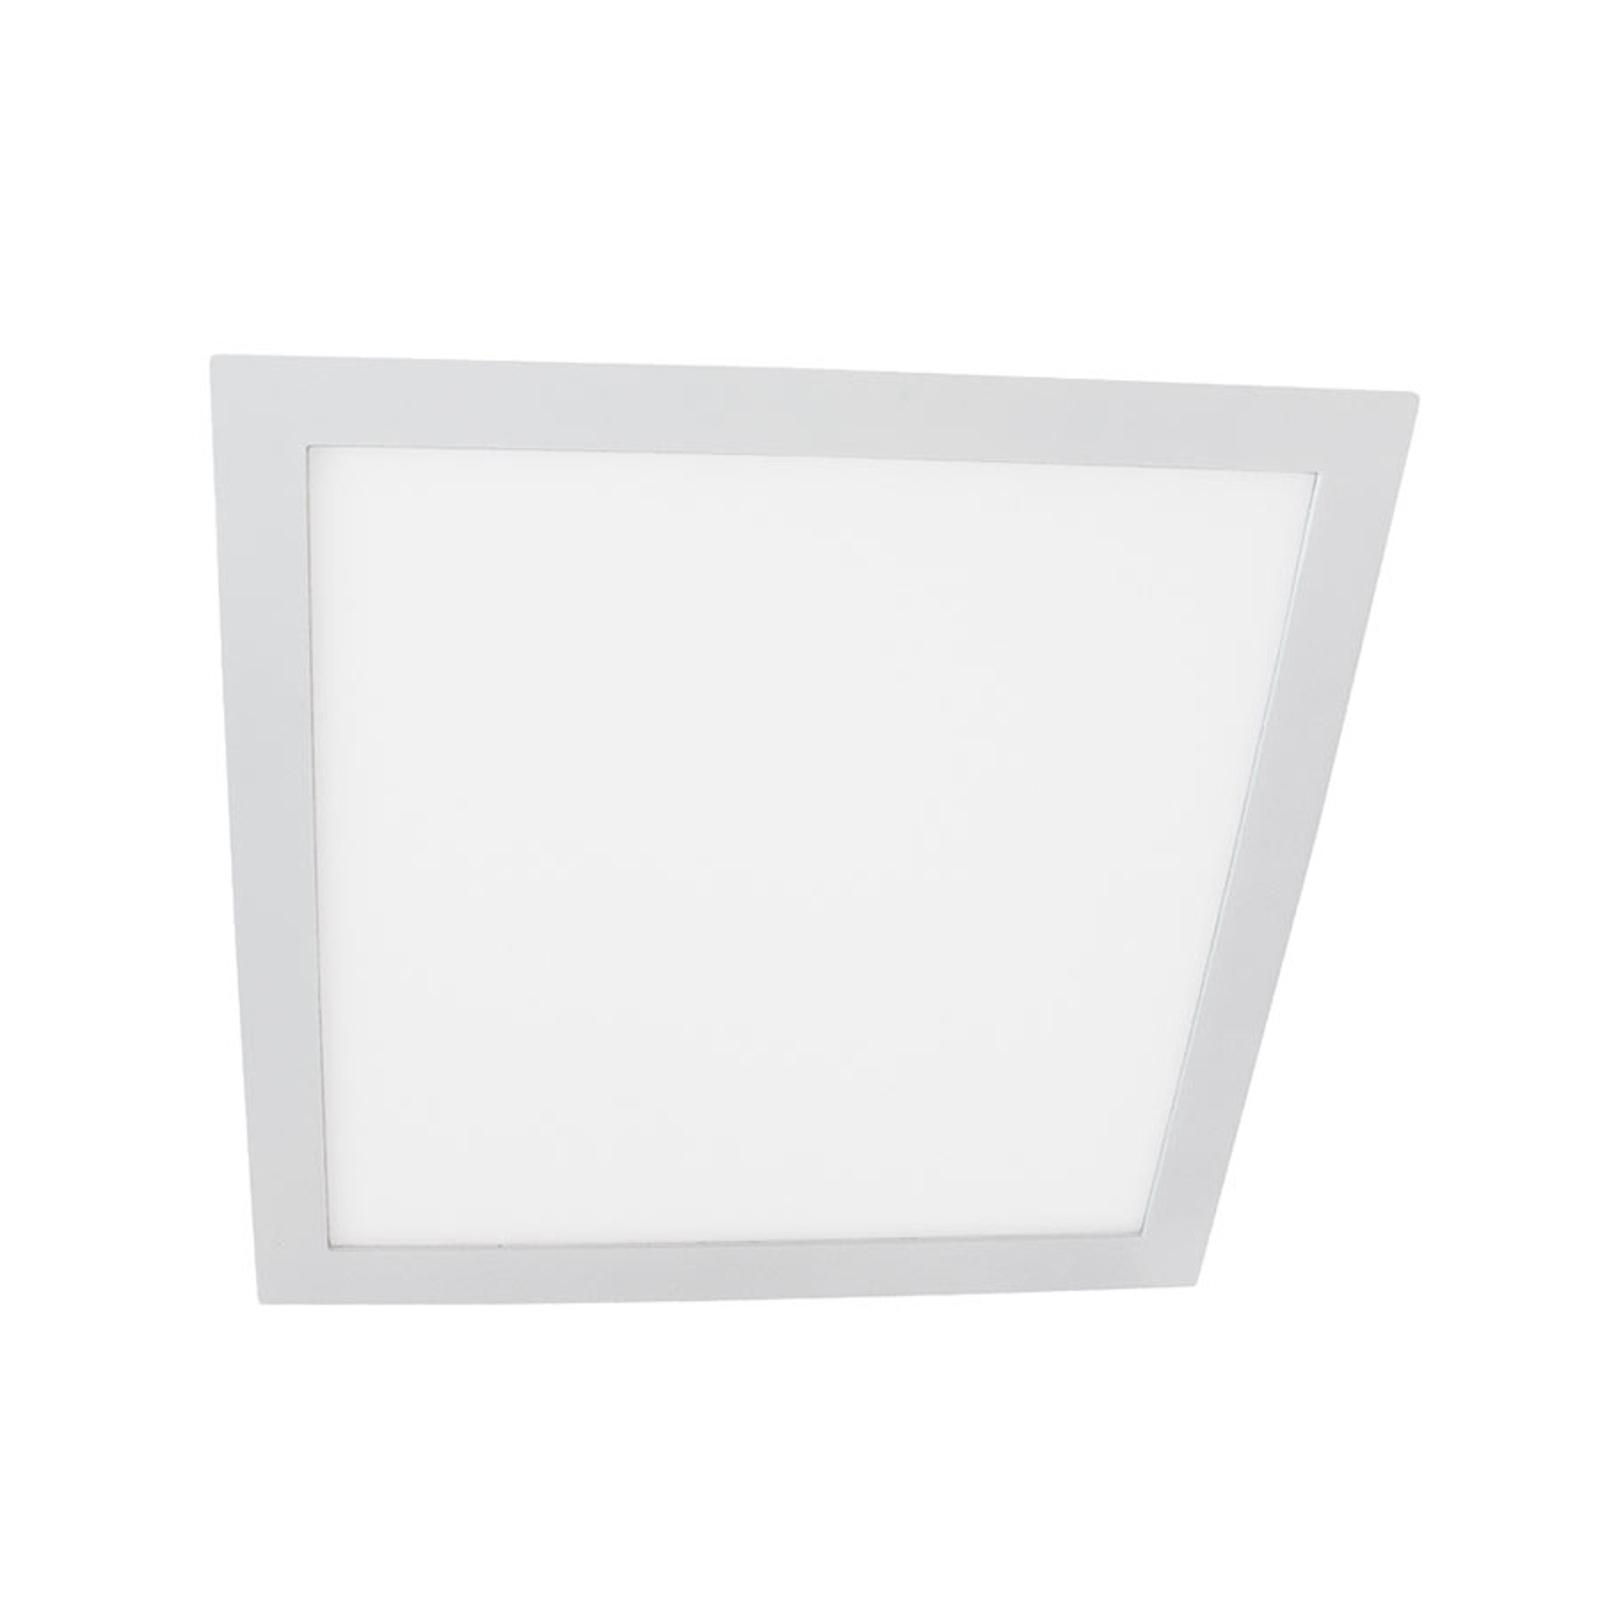 Moon Square LED-downlight 12W, 4 000 K